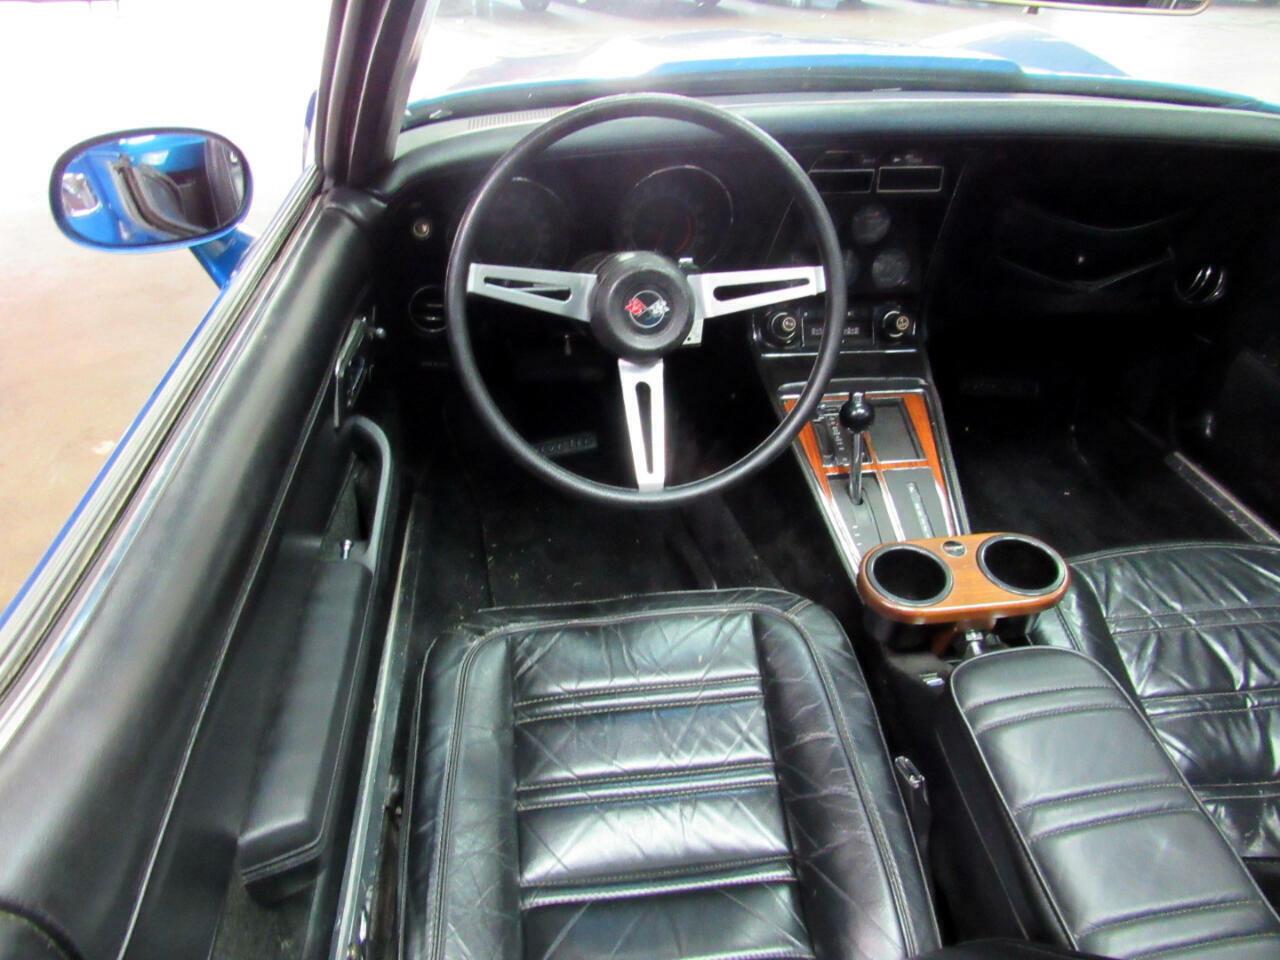 1974 Blue Chevrolet Corvette Convertible  | C3 Corvette Photo 10